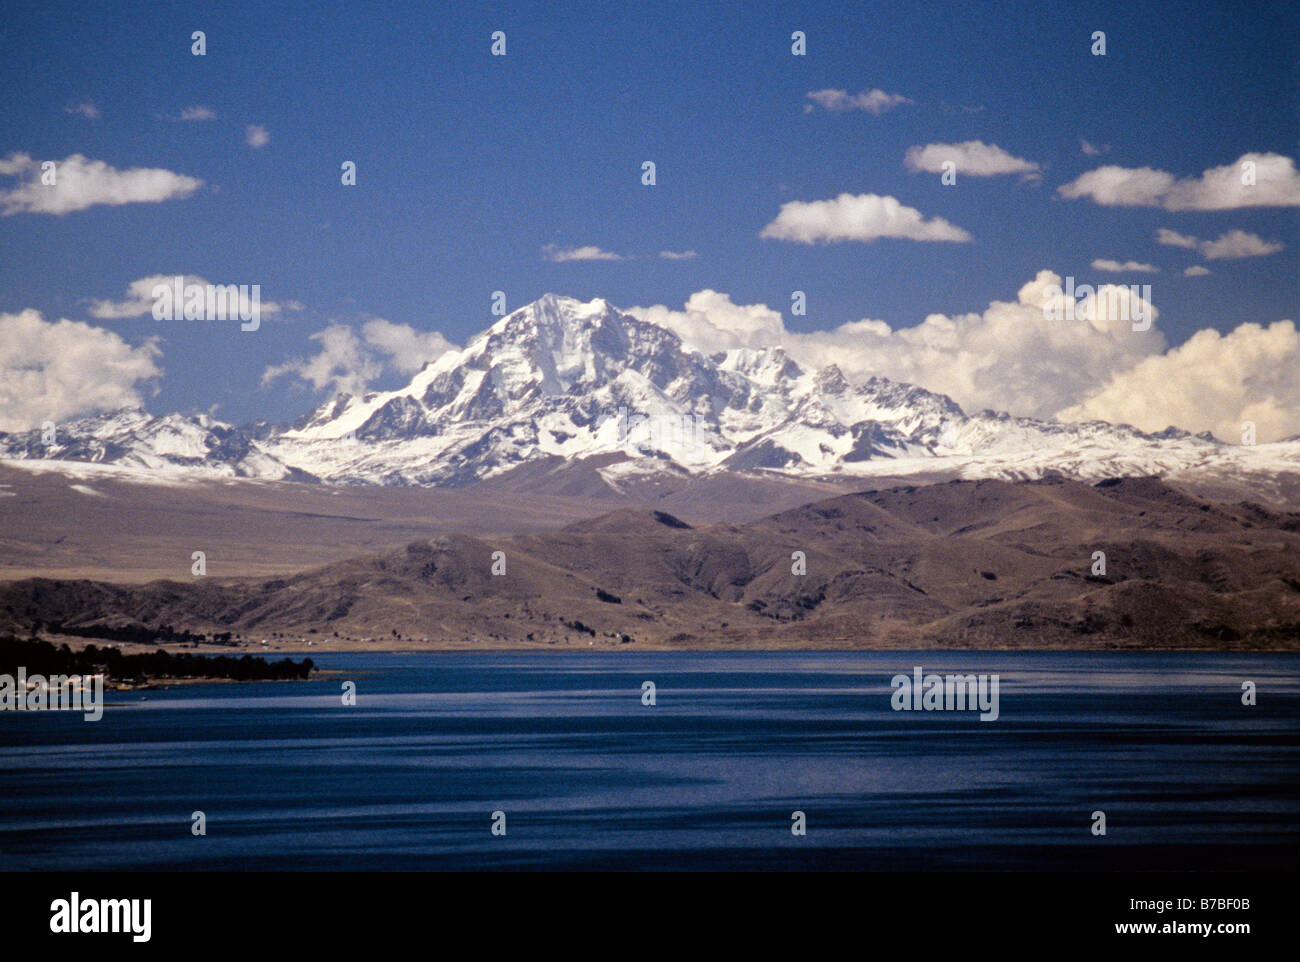 Bolivian Andes peak Mount Nevado Illampu and Lake Titicaca, view from Isla del Sol - Stock Image